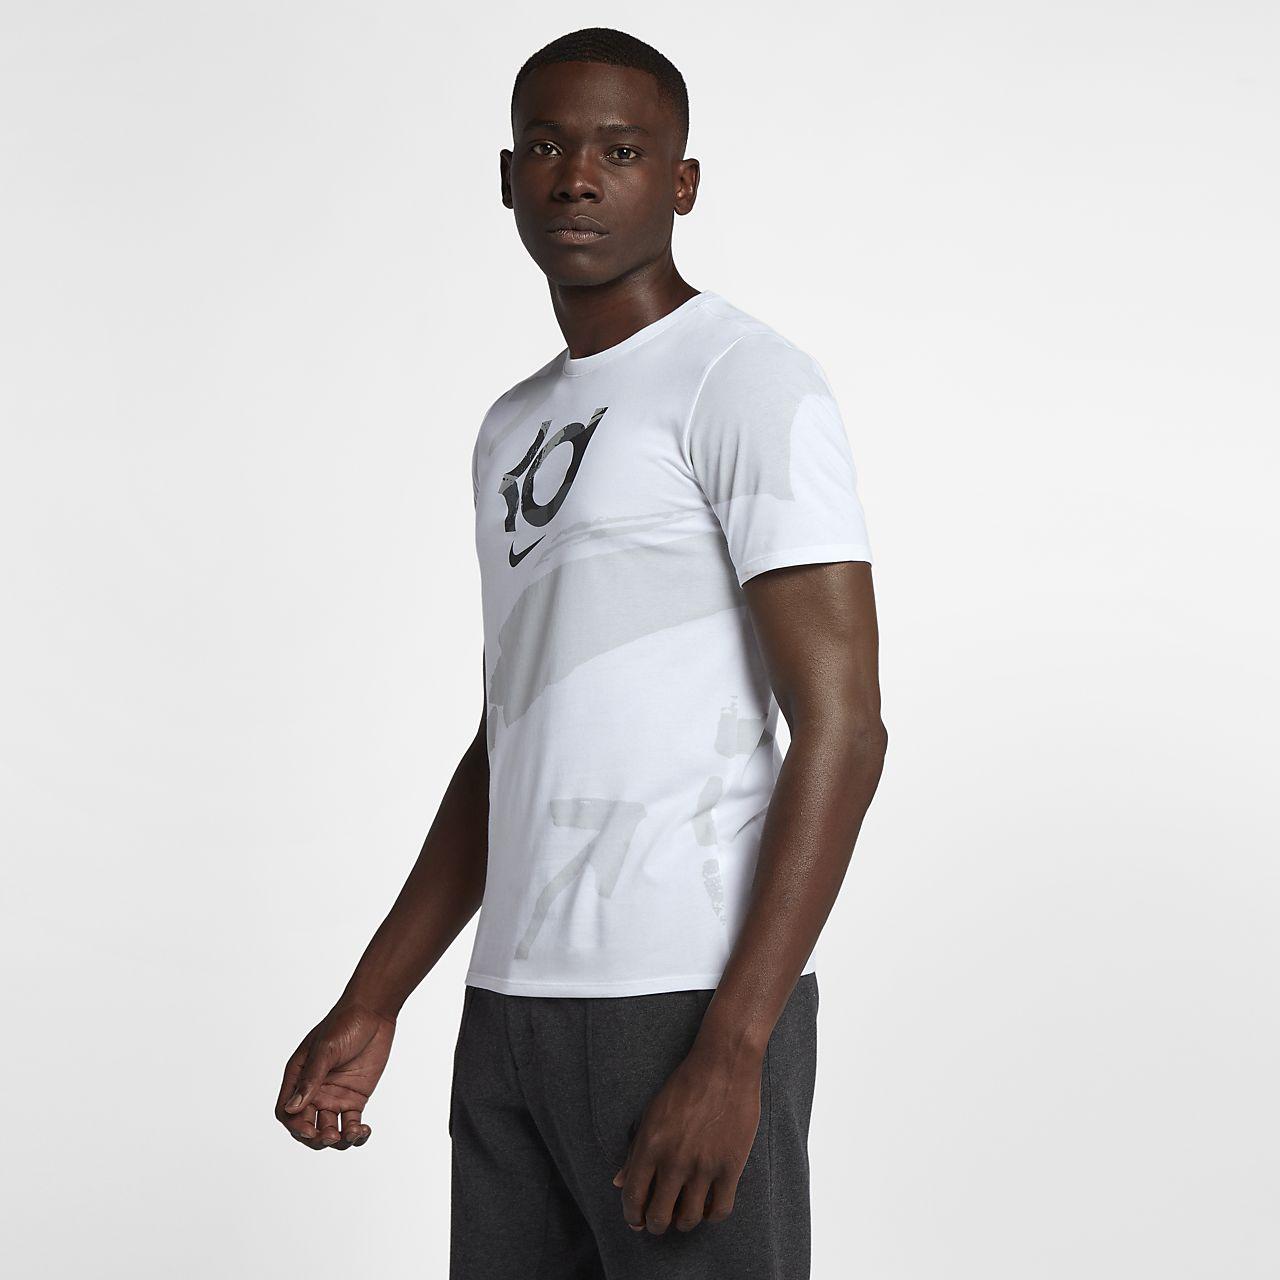 b84c414f9 Nike Dri-FIT KD Men's Basketball T-Shirt. Nike.com BE